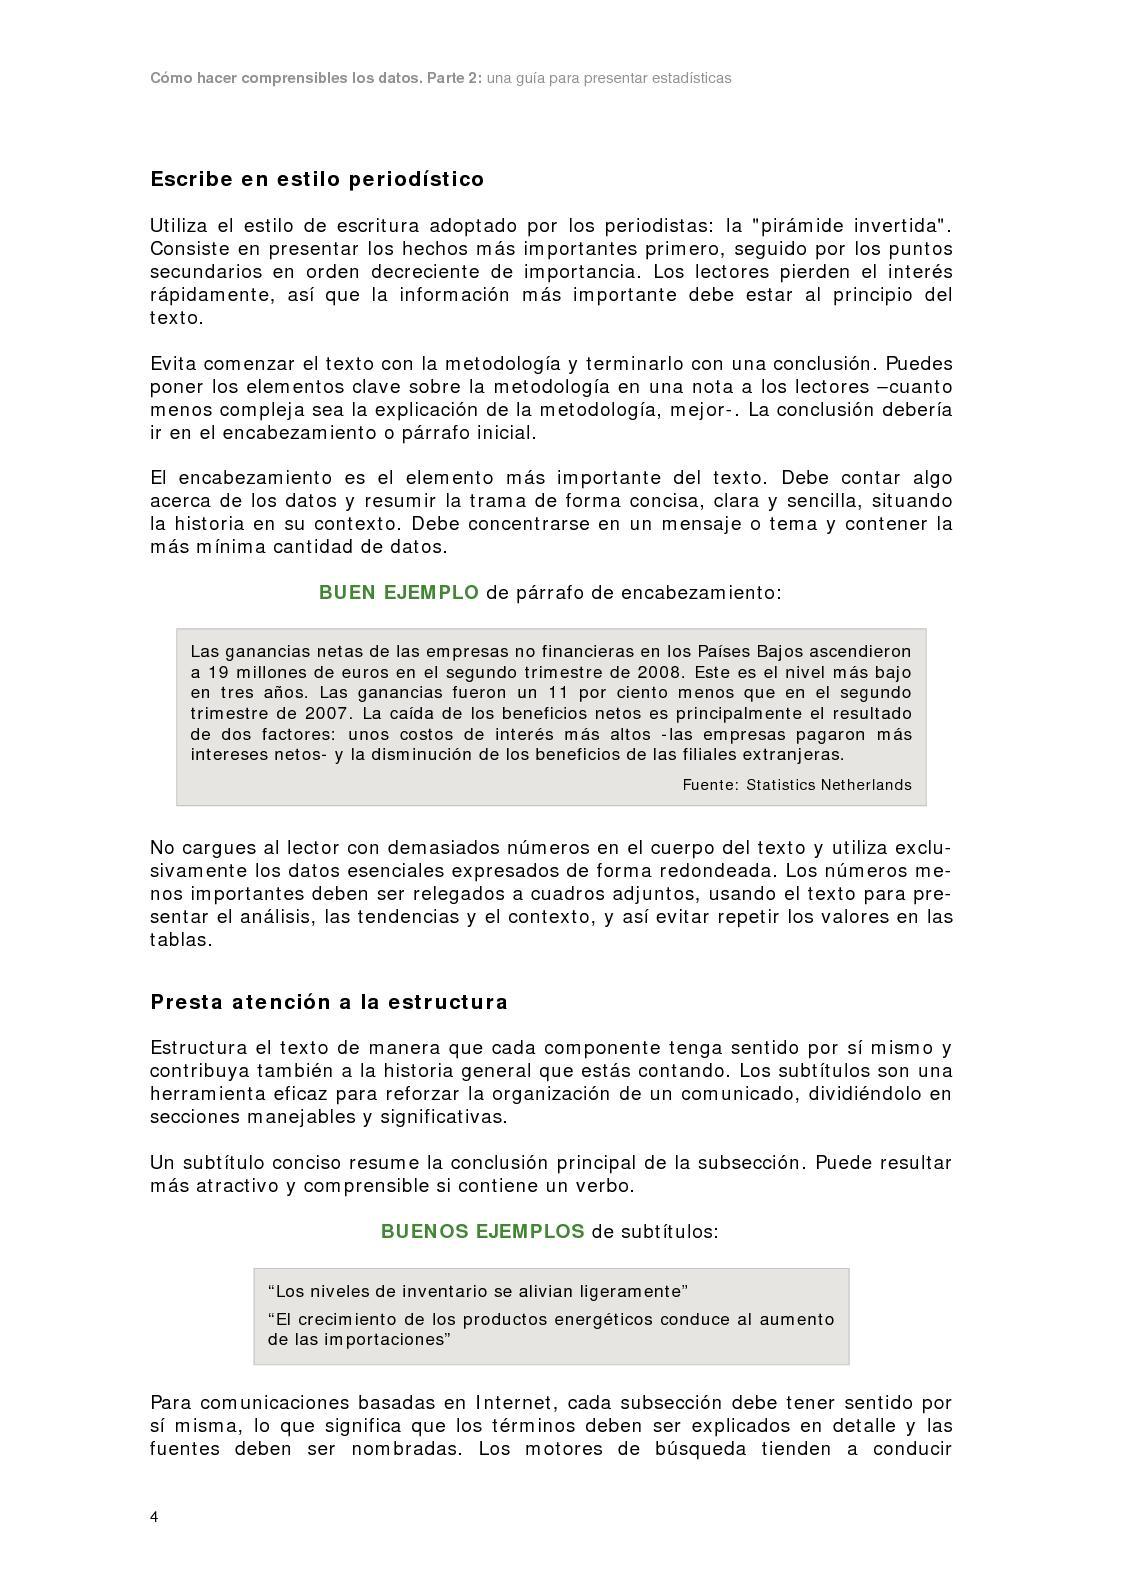 MDM Part2 Spanish - CALAMEO Downloader